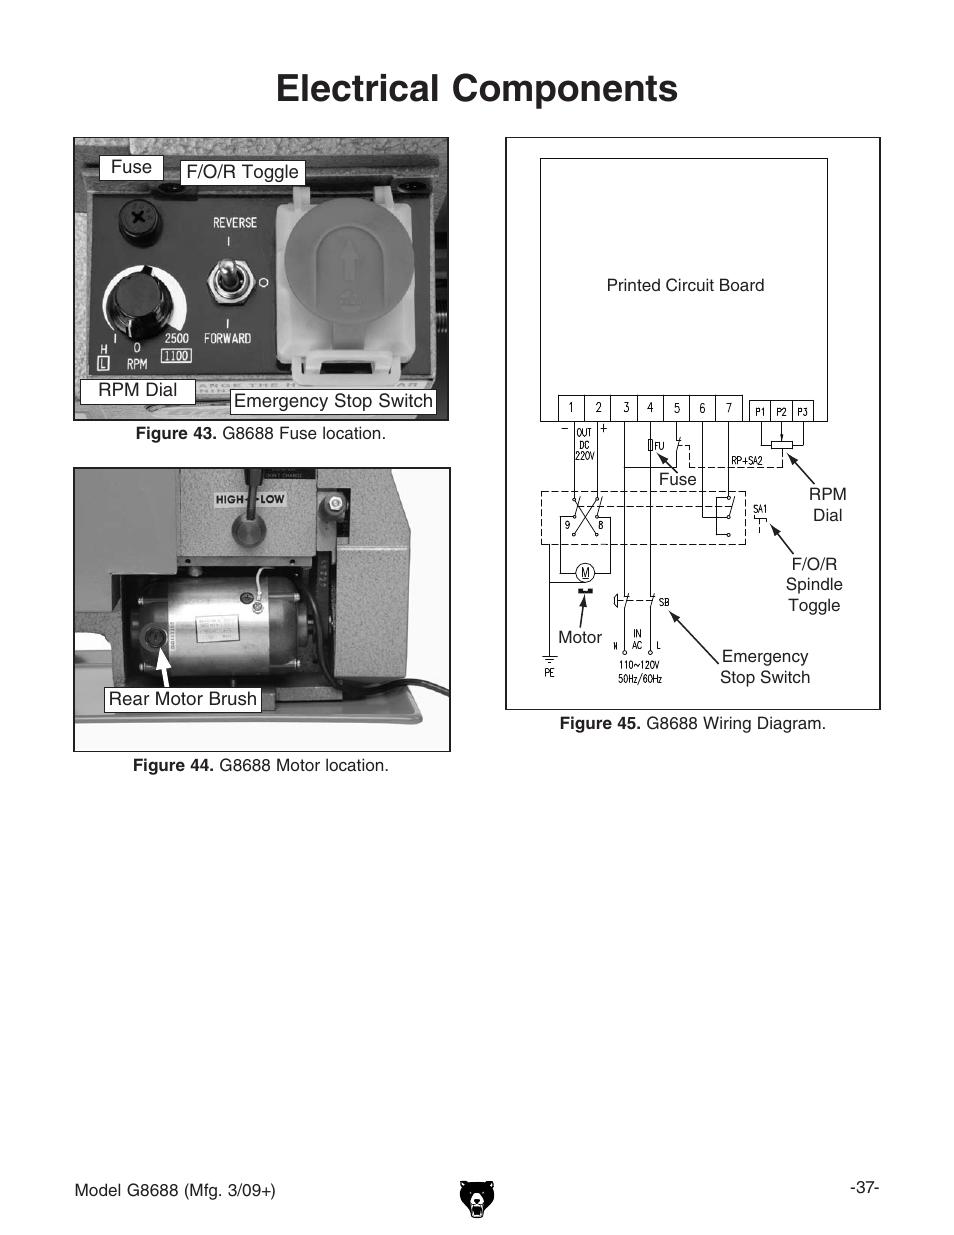 Emergency Light Circuit Diagram Switch Free Download Wiring Diagram